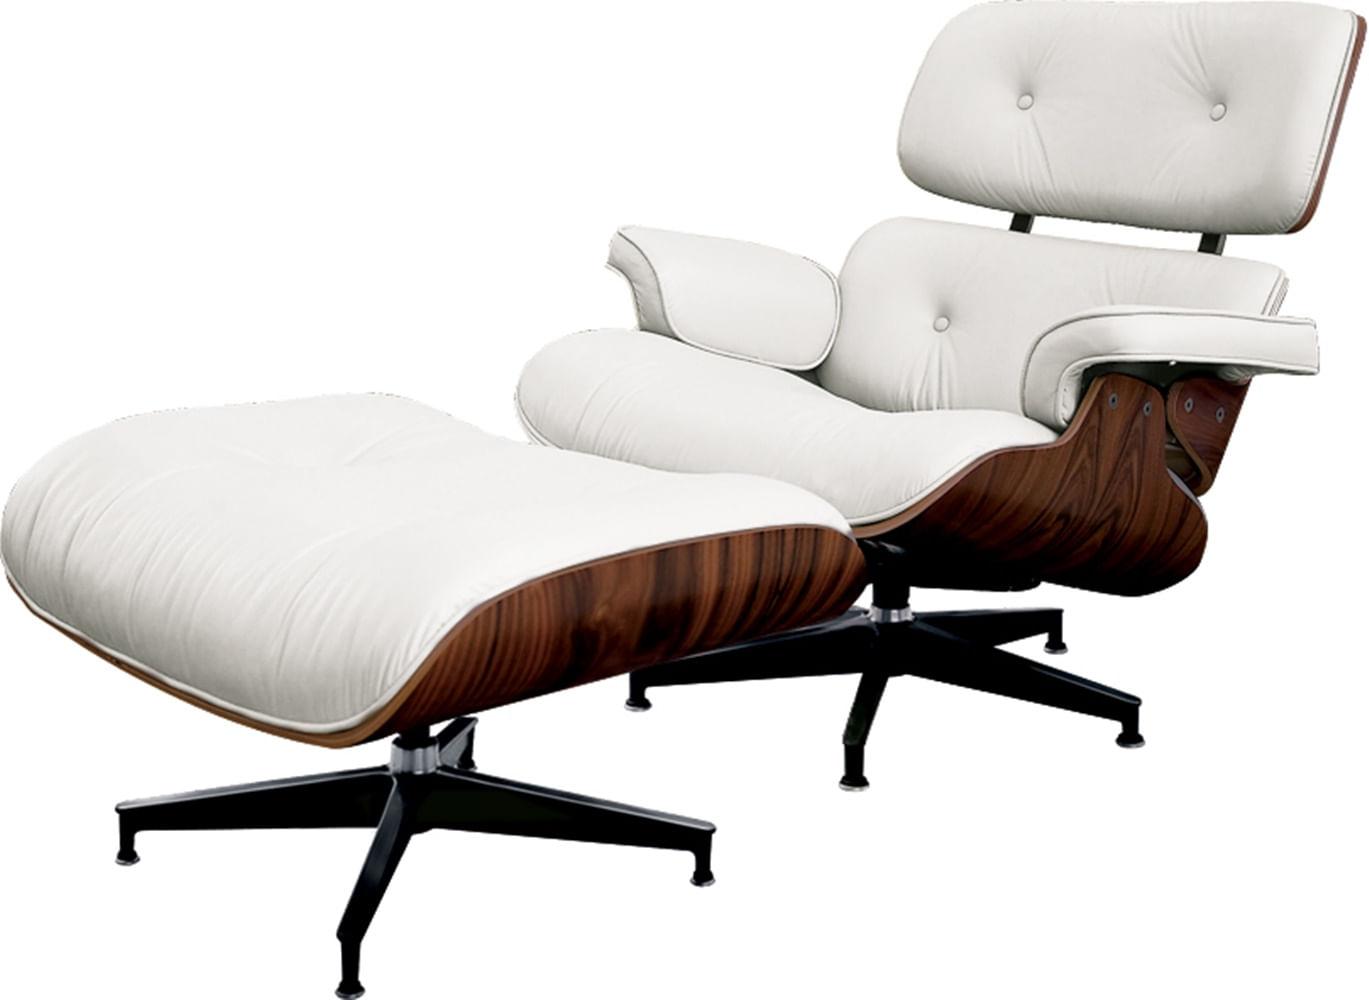 Poltrona Charles Eames com Puff Couro Natural Branco - 34560